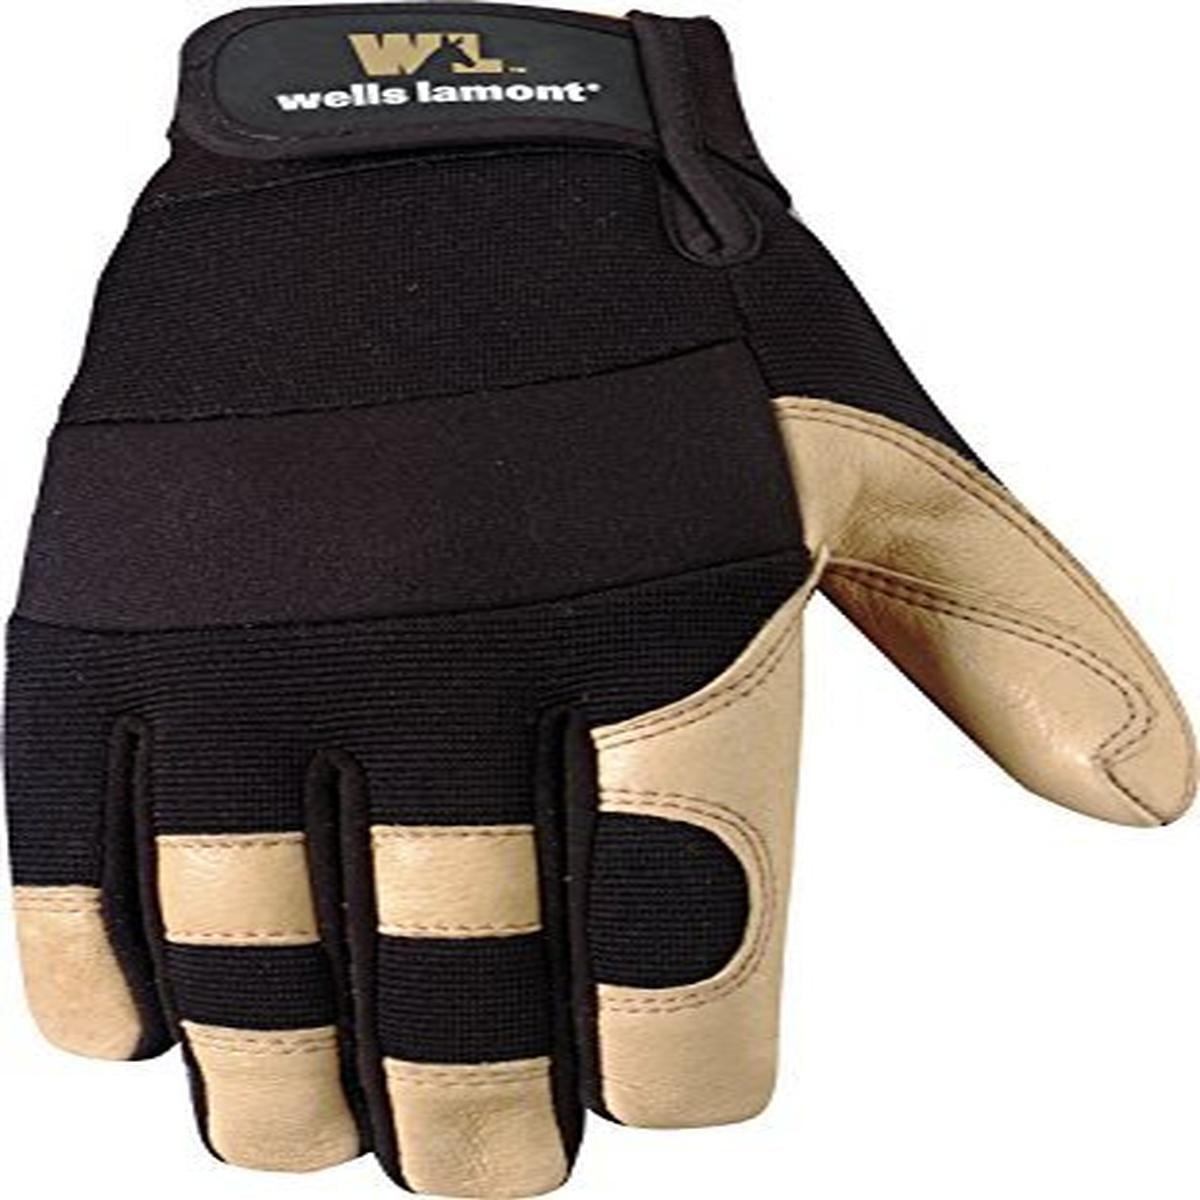 Wells Lamont Ultra Comfort Work Gloves, Grain Leather, Abrasive Resistant Palm, X-Large, Palomino/Black (3214XL)